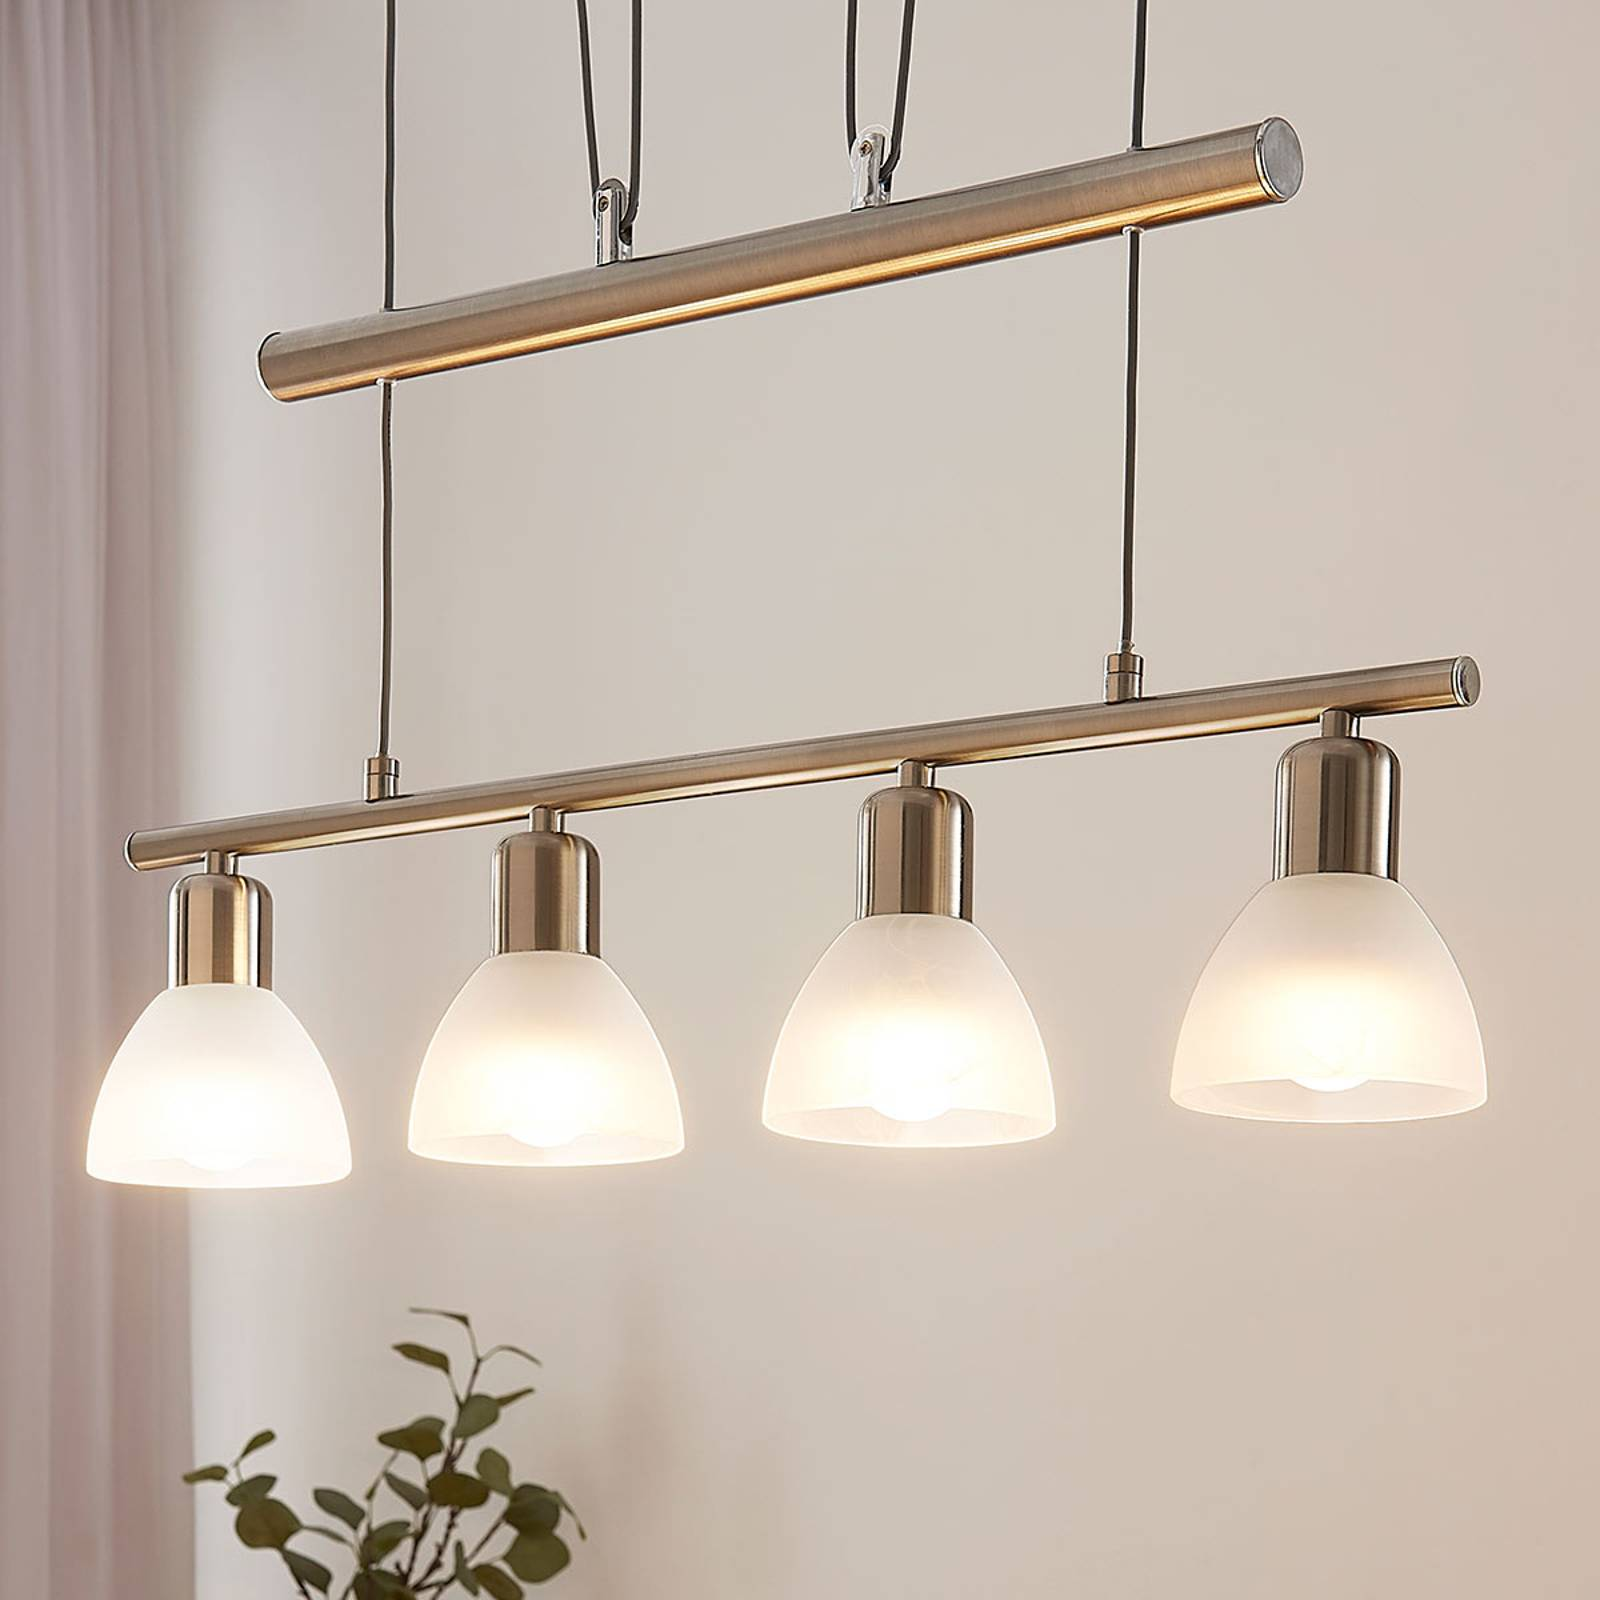 Lampa wisząca LED w formie belki Gwendolin